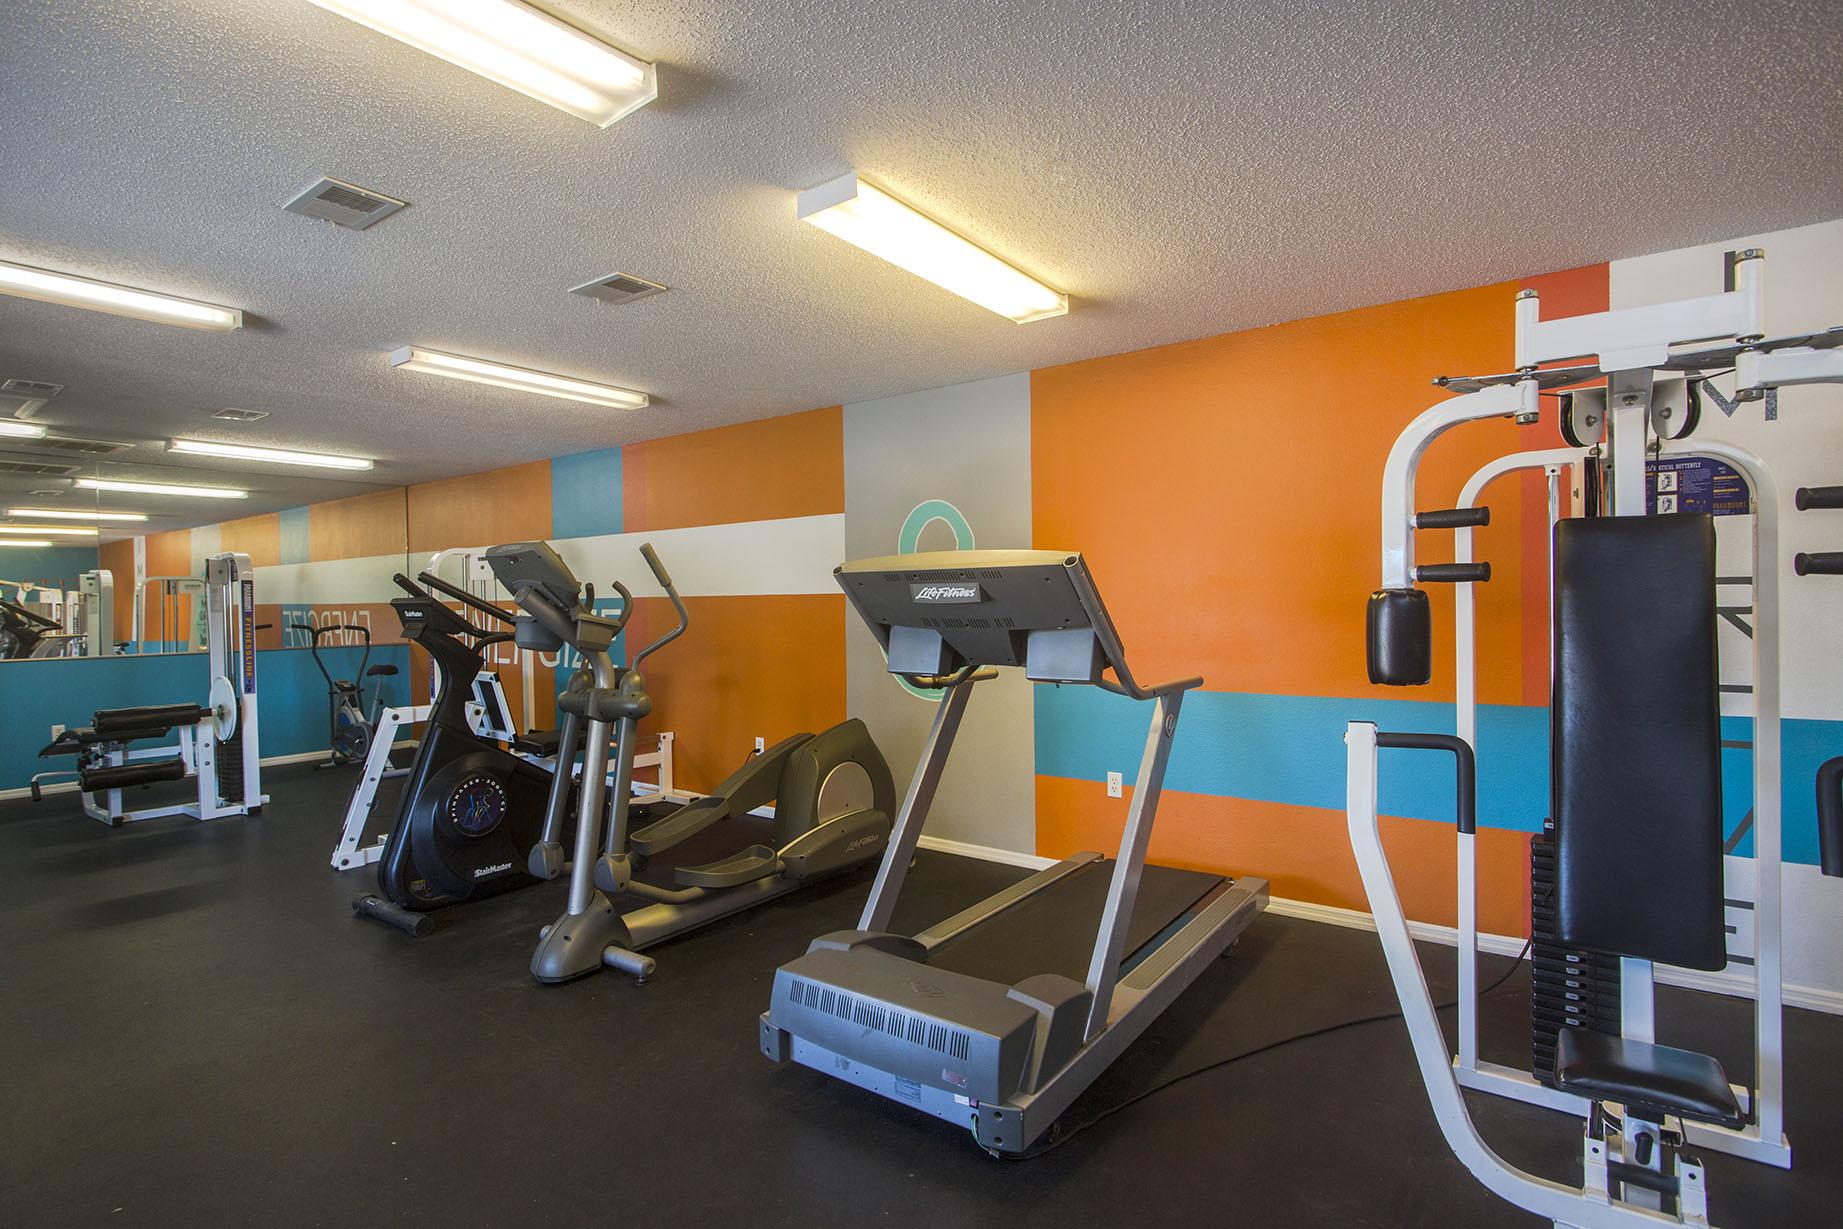 brandon-florida-charleston-landings-apartment-one-bedroom-rental-two-pool-gym